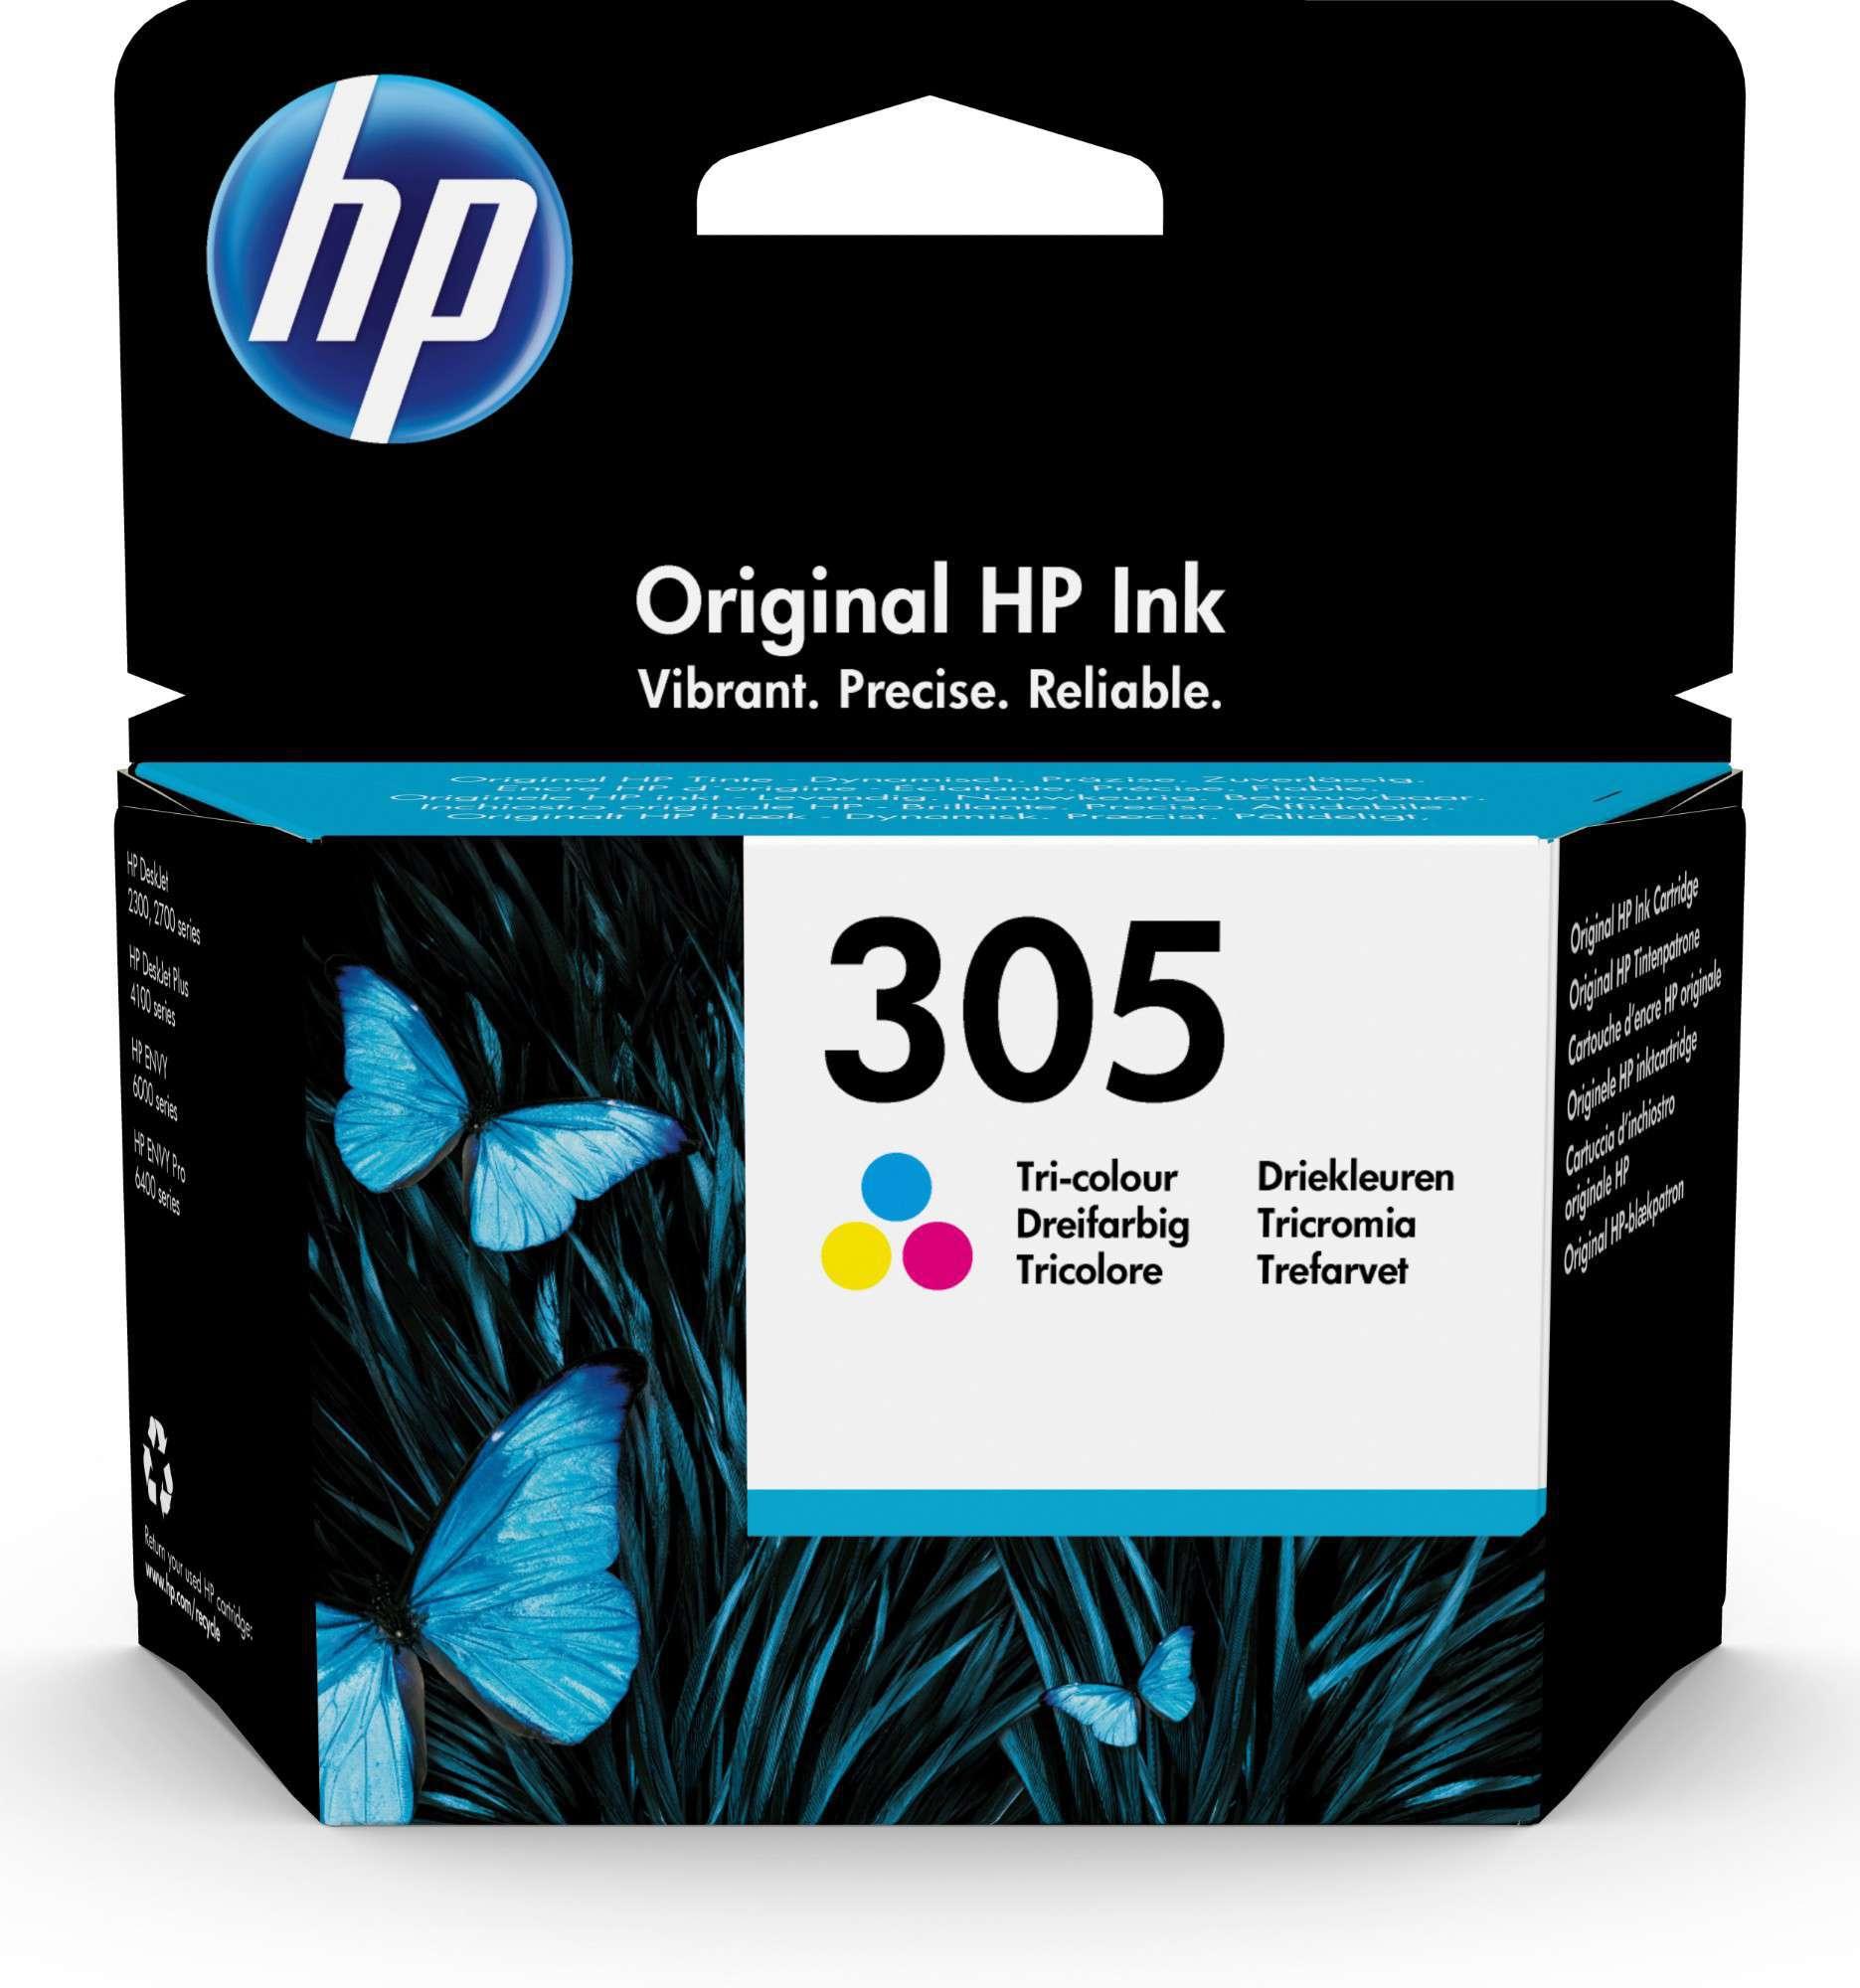 HP Original 305 Tri-Colour Inkjet Cartridge 3YM60AE